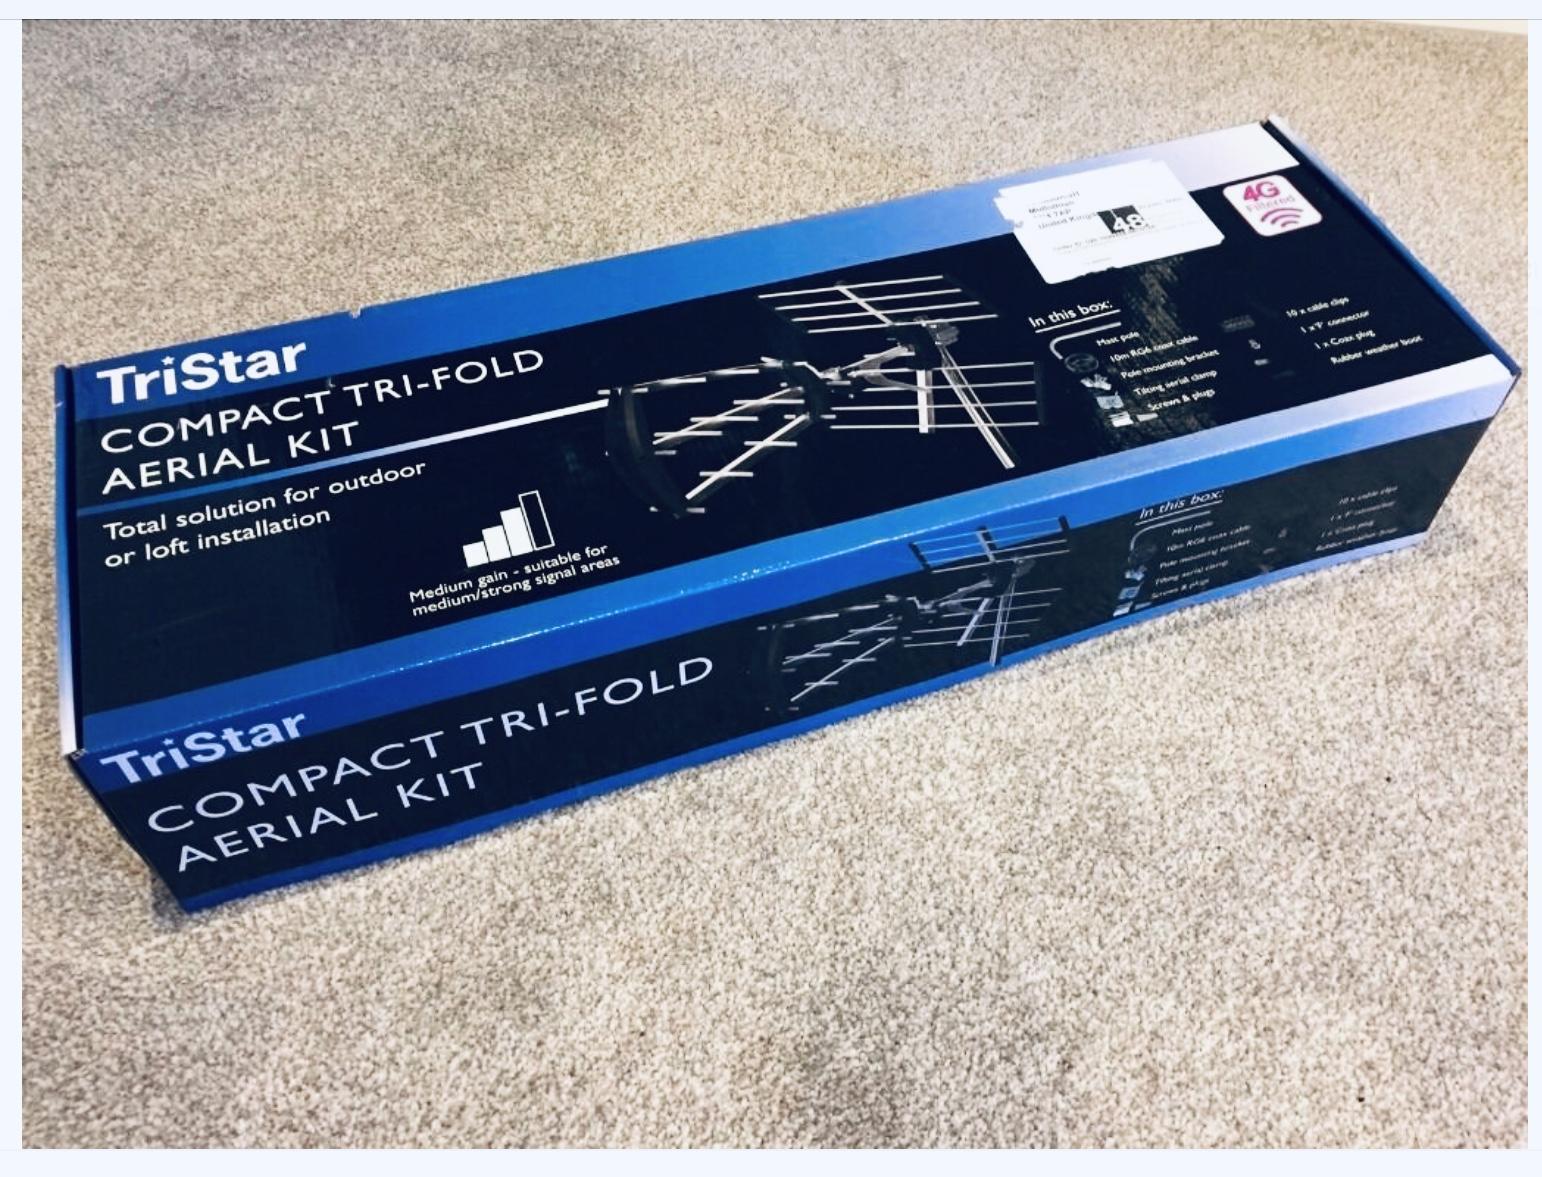 TriStar Digital TV Aerial Compact Tri-Fold Kit 4G Filter